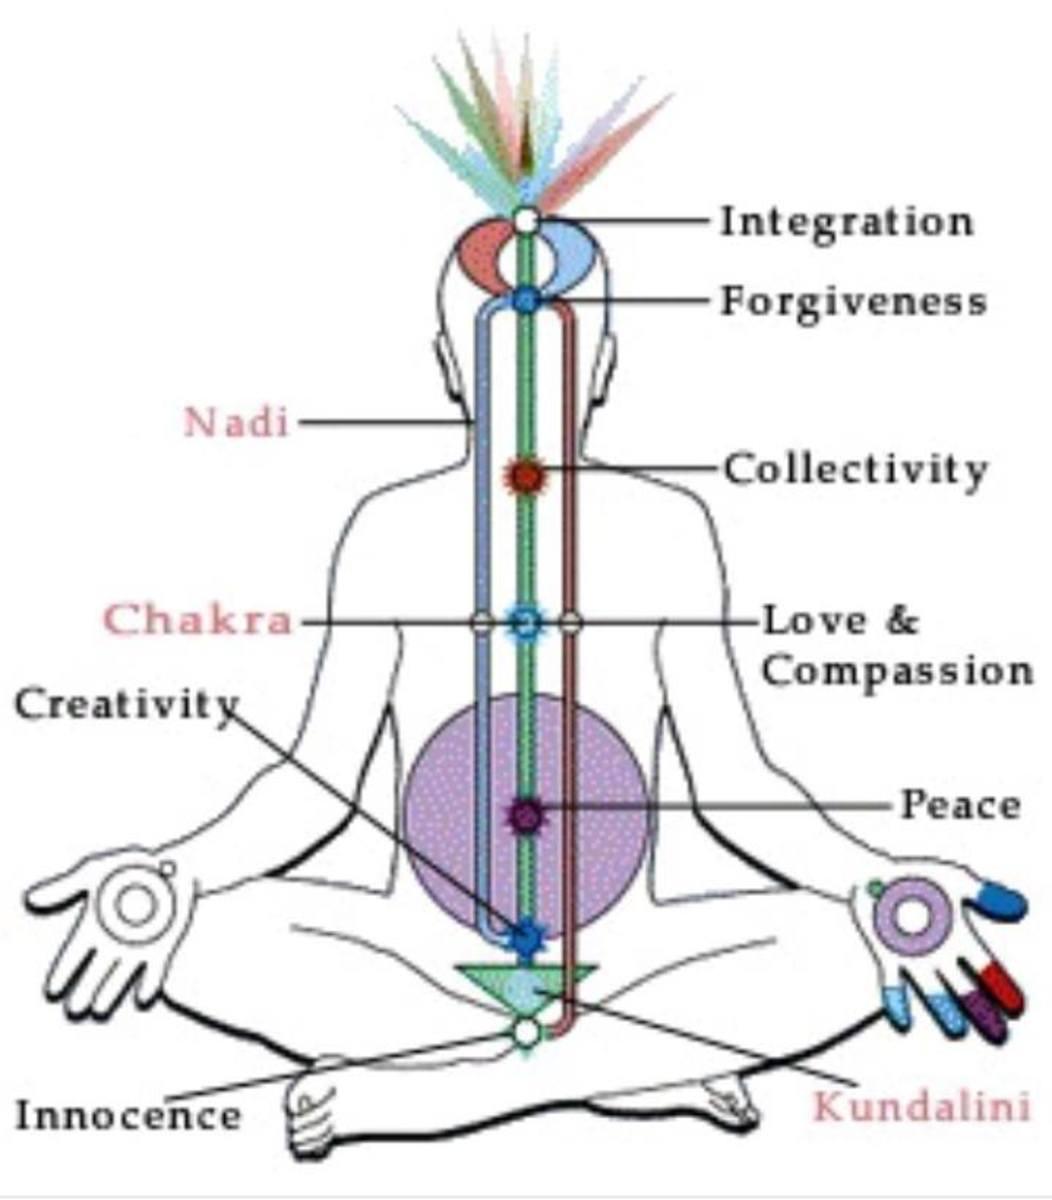 Kundalini is a psychophysiological event